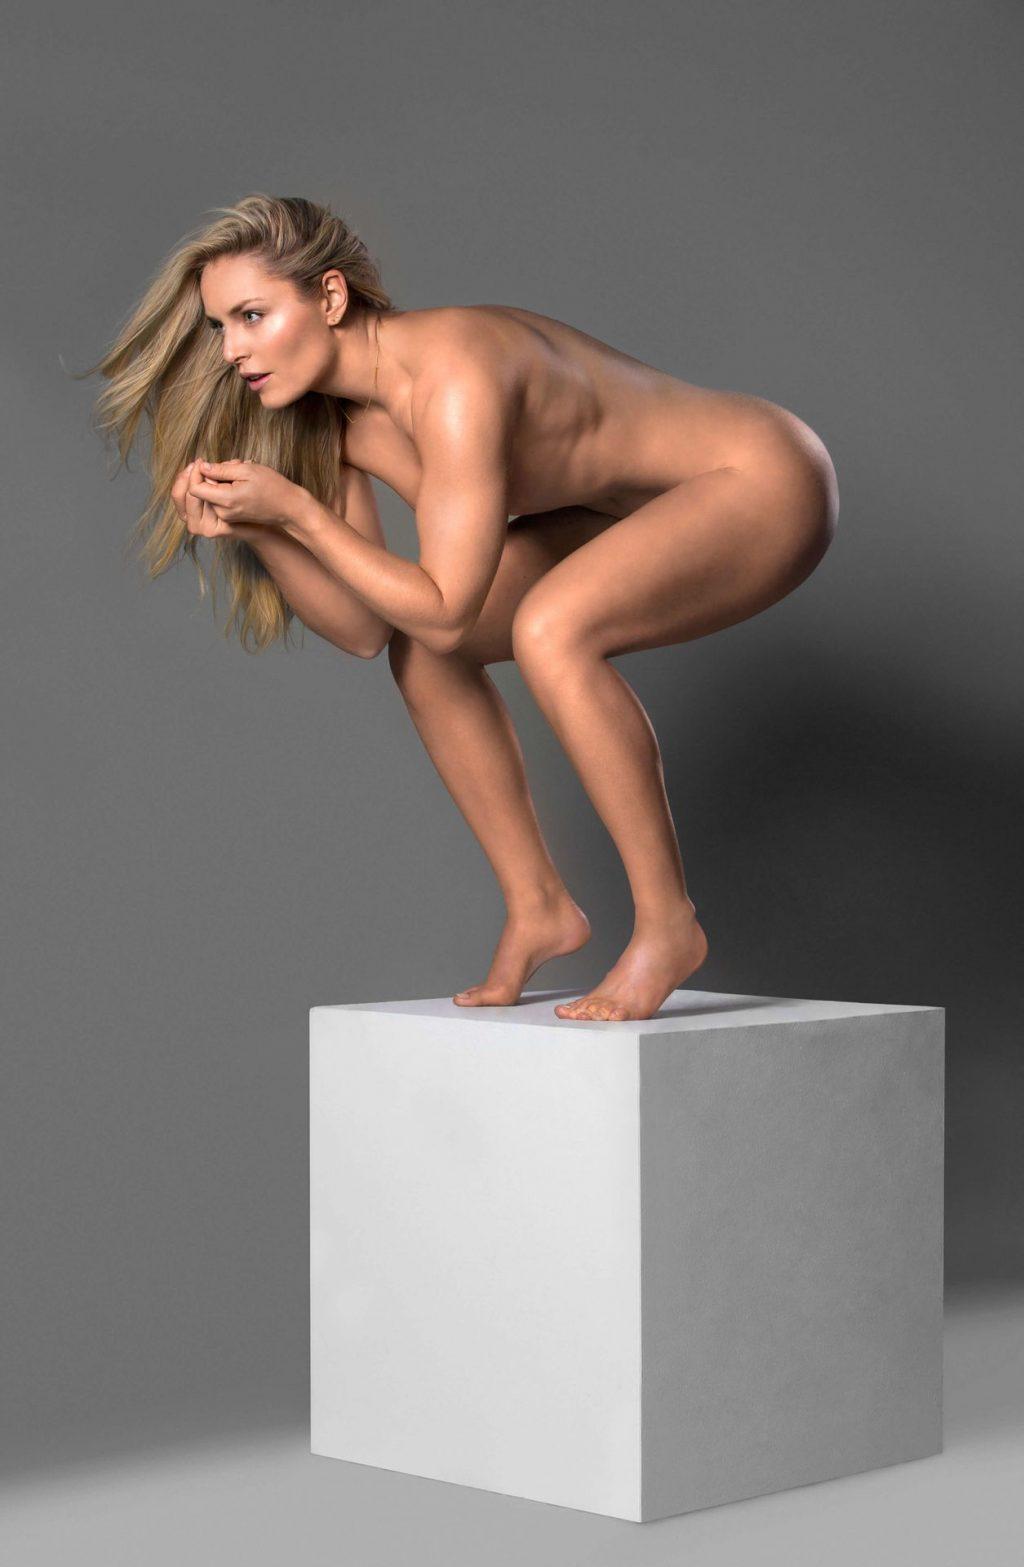 Lindsey Vonn Hot (2 Photos)